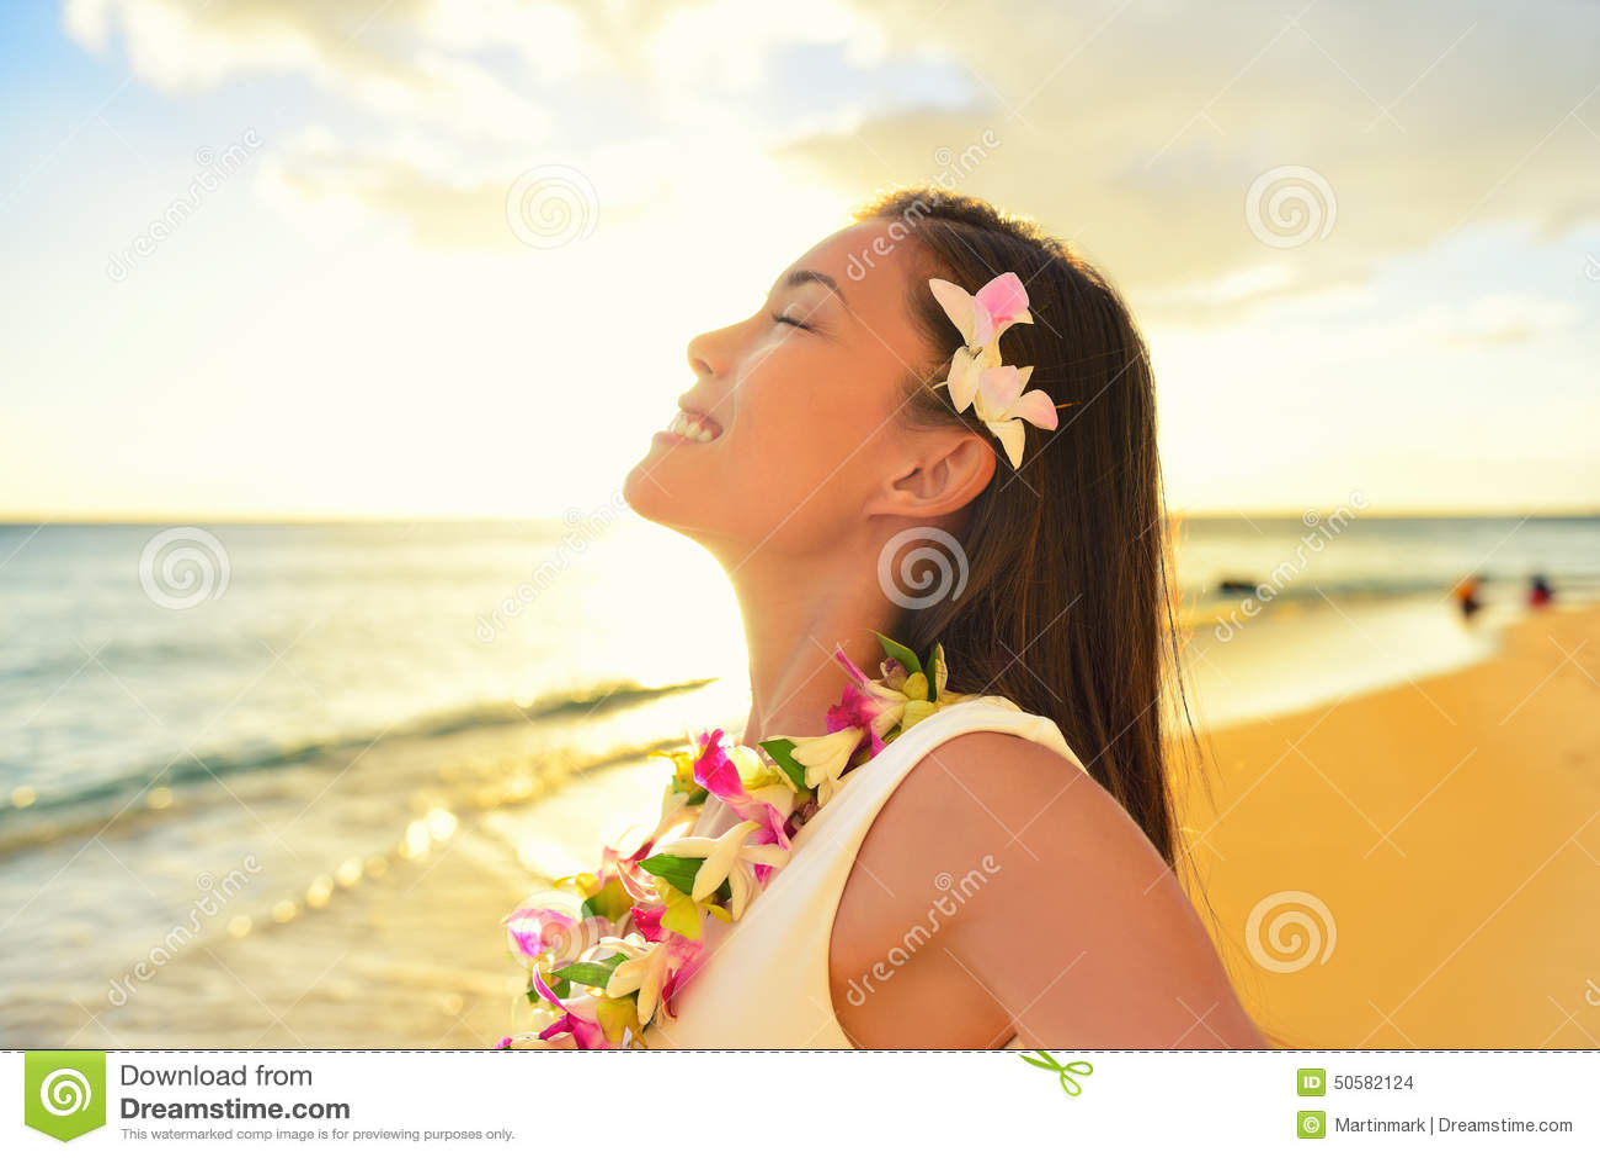 happy woman relaxing on hawaii beach vacation stock photo free hawaiian clip art surf boards free hawaiian clip art frames